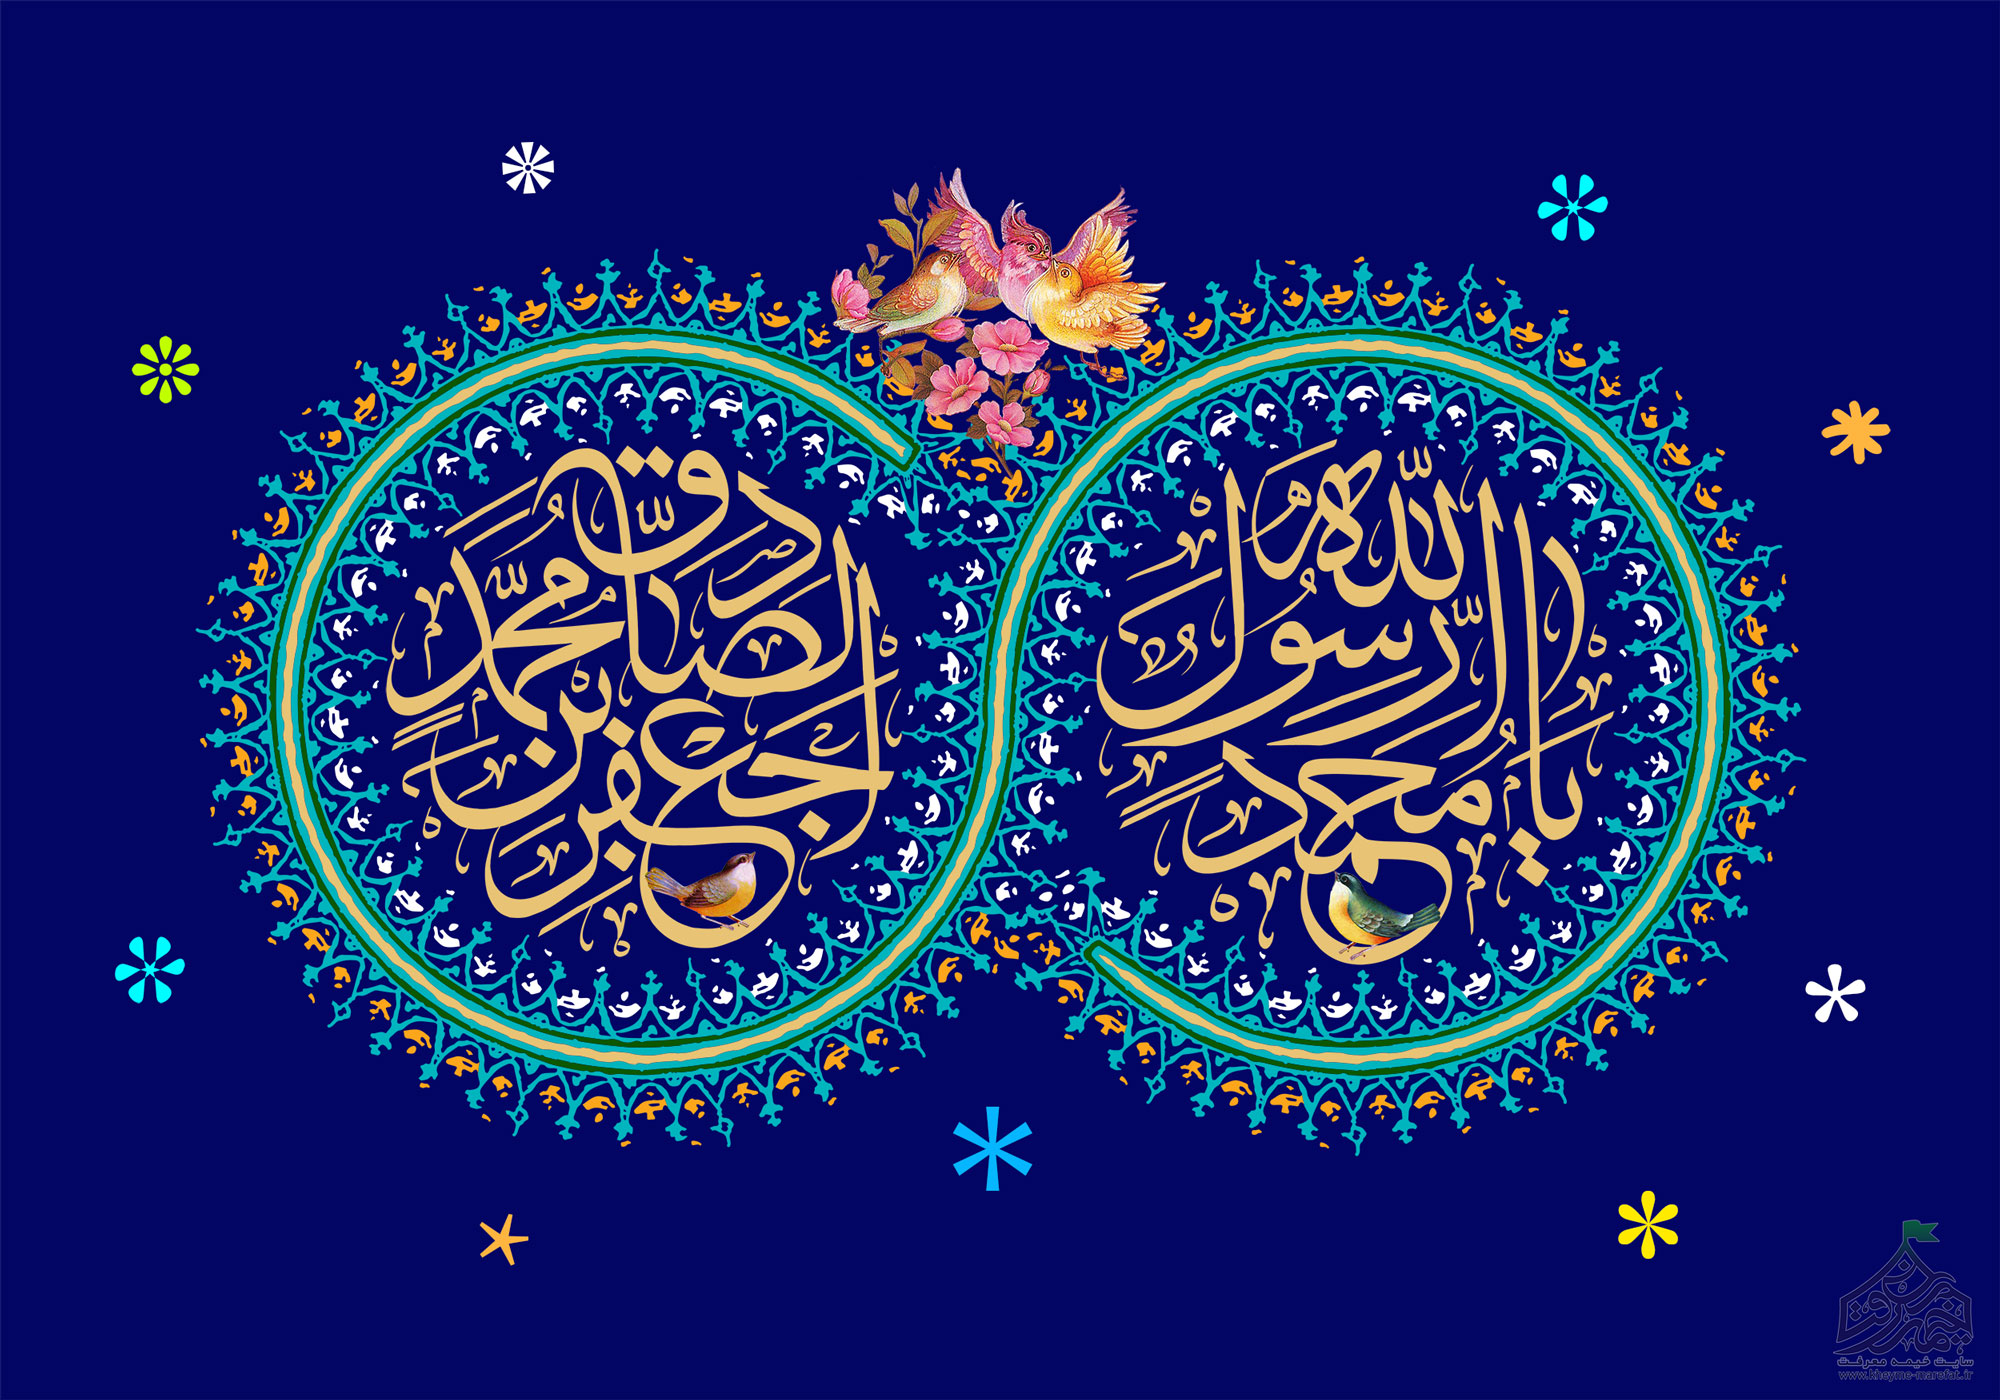 پیامبر رحمت ، صادق آل محمد